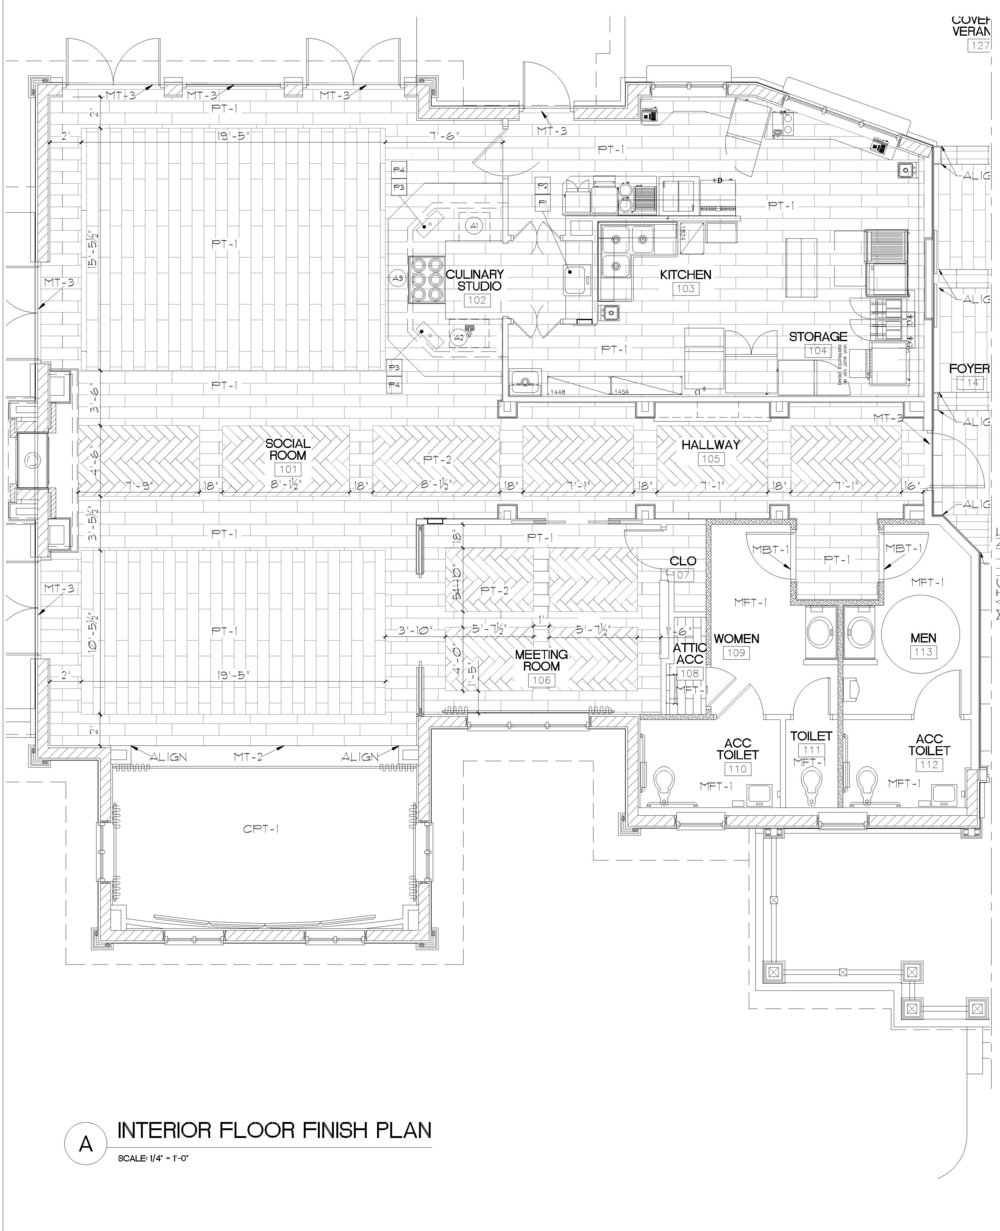 Micamy Design Studio_Interior Design_Beacon Lake_Amenity Center_Clubhouse_New England Style_Nautical_Hallway_Barrel Ceiling_Pendants_Herringbone Tile_Sconces_Ship